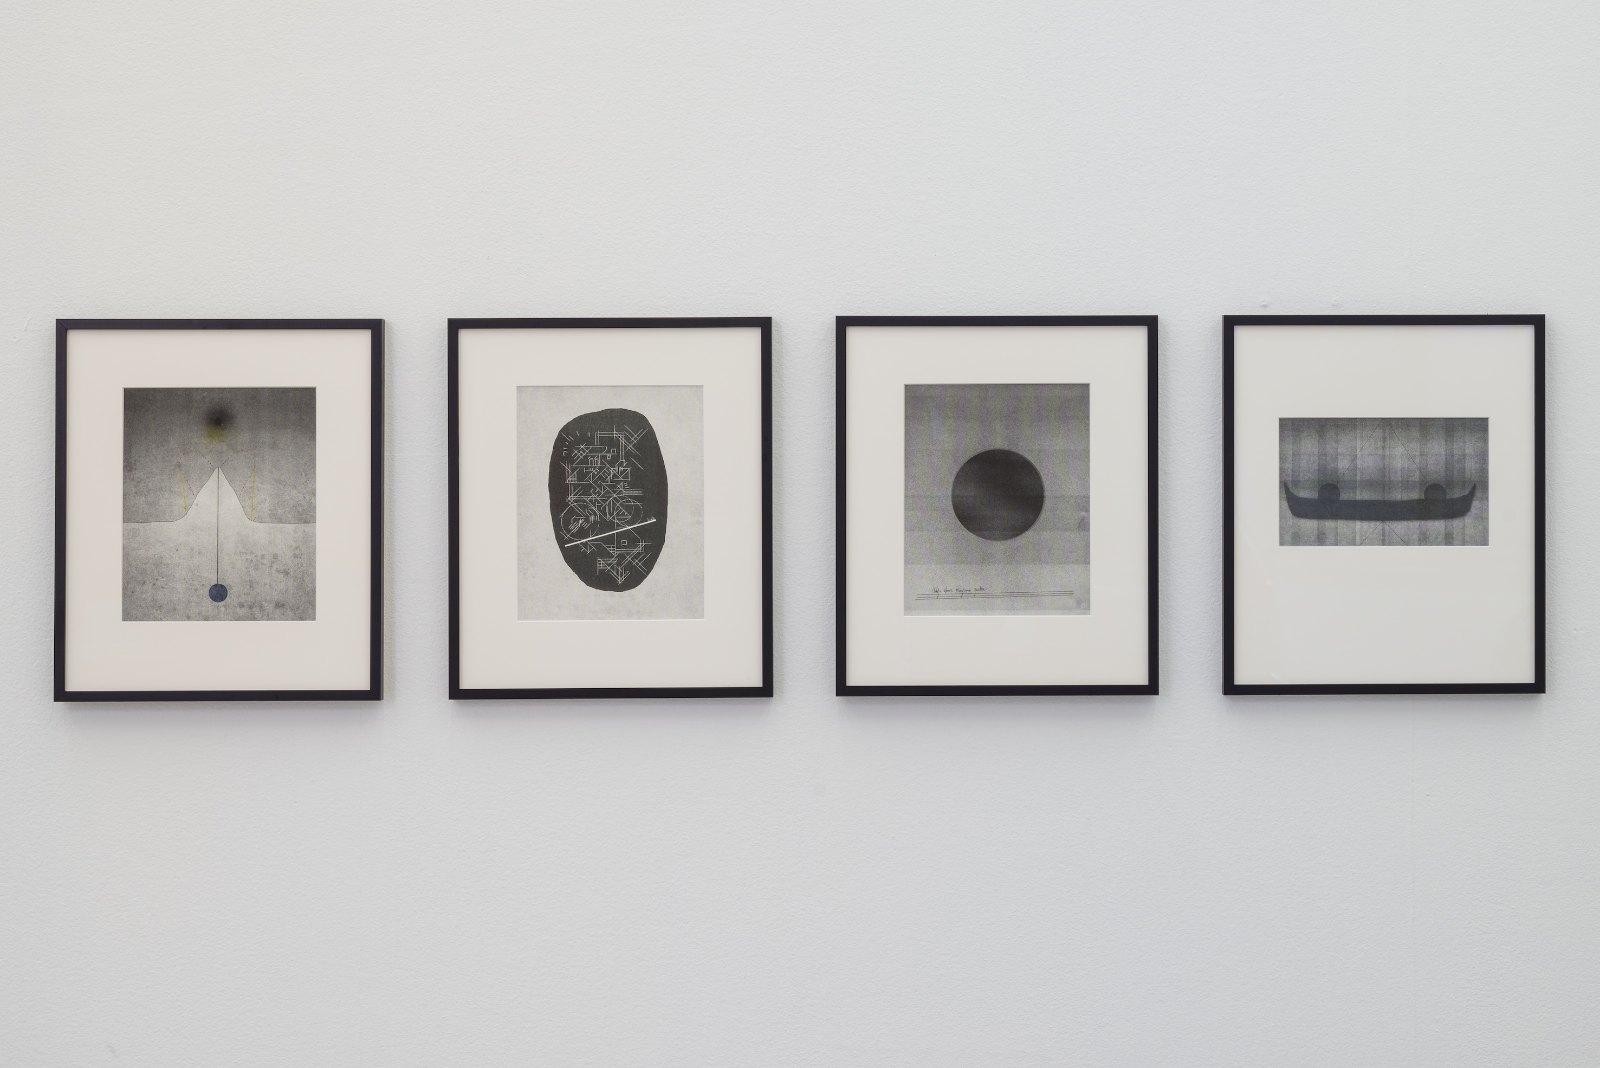 From left: Andreas Nilsson, Pioneertown, Kalifornien, 2015, risograph print, 15 x 24 cm. Paperboy, 2015, risograph print, 21 x 27 cm. Tarfala, 2015. Risograph print, 21 x 27 cm. William blakes kanot, 2015, Risograph print, 21 x 27 cm